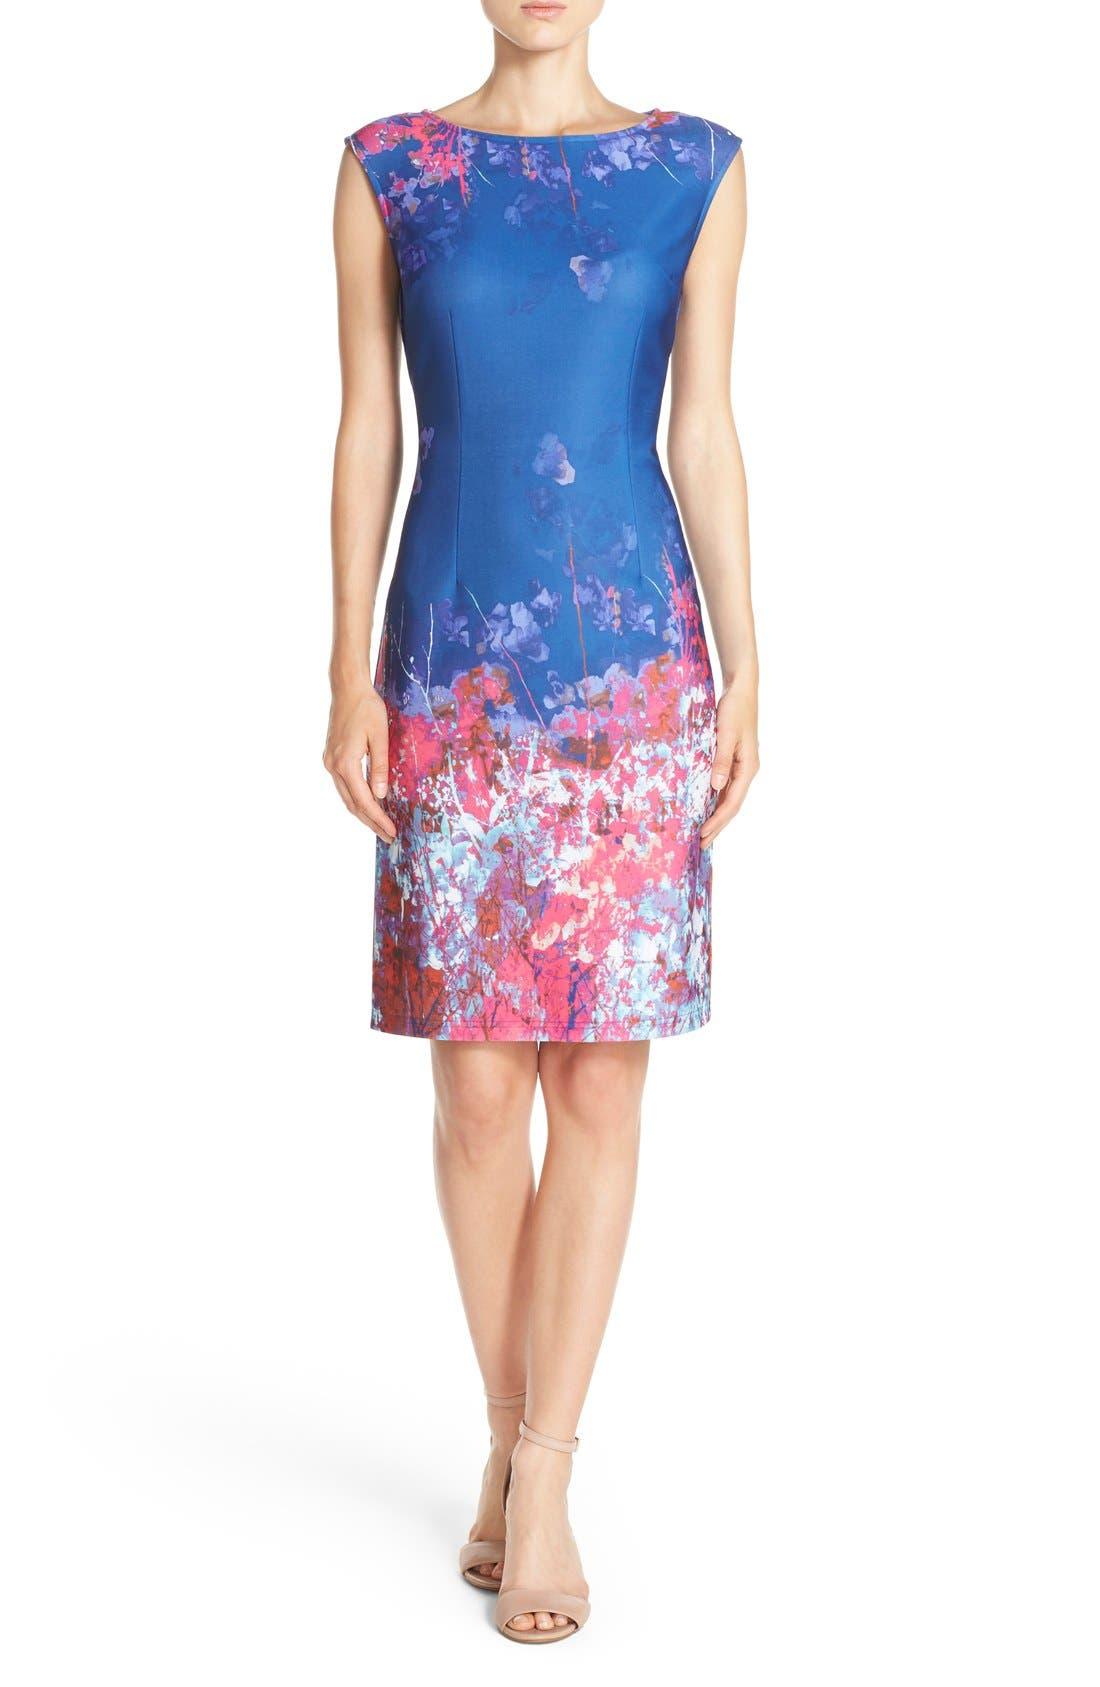 Alternate Image 1 Selected - Adrianna Papell Floral Border Print Scuba Sheath Dress